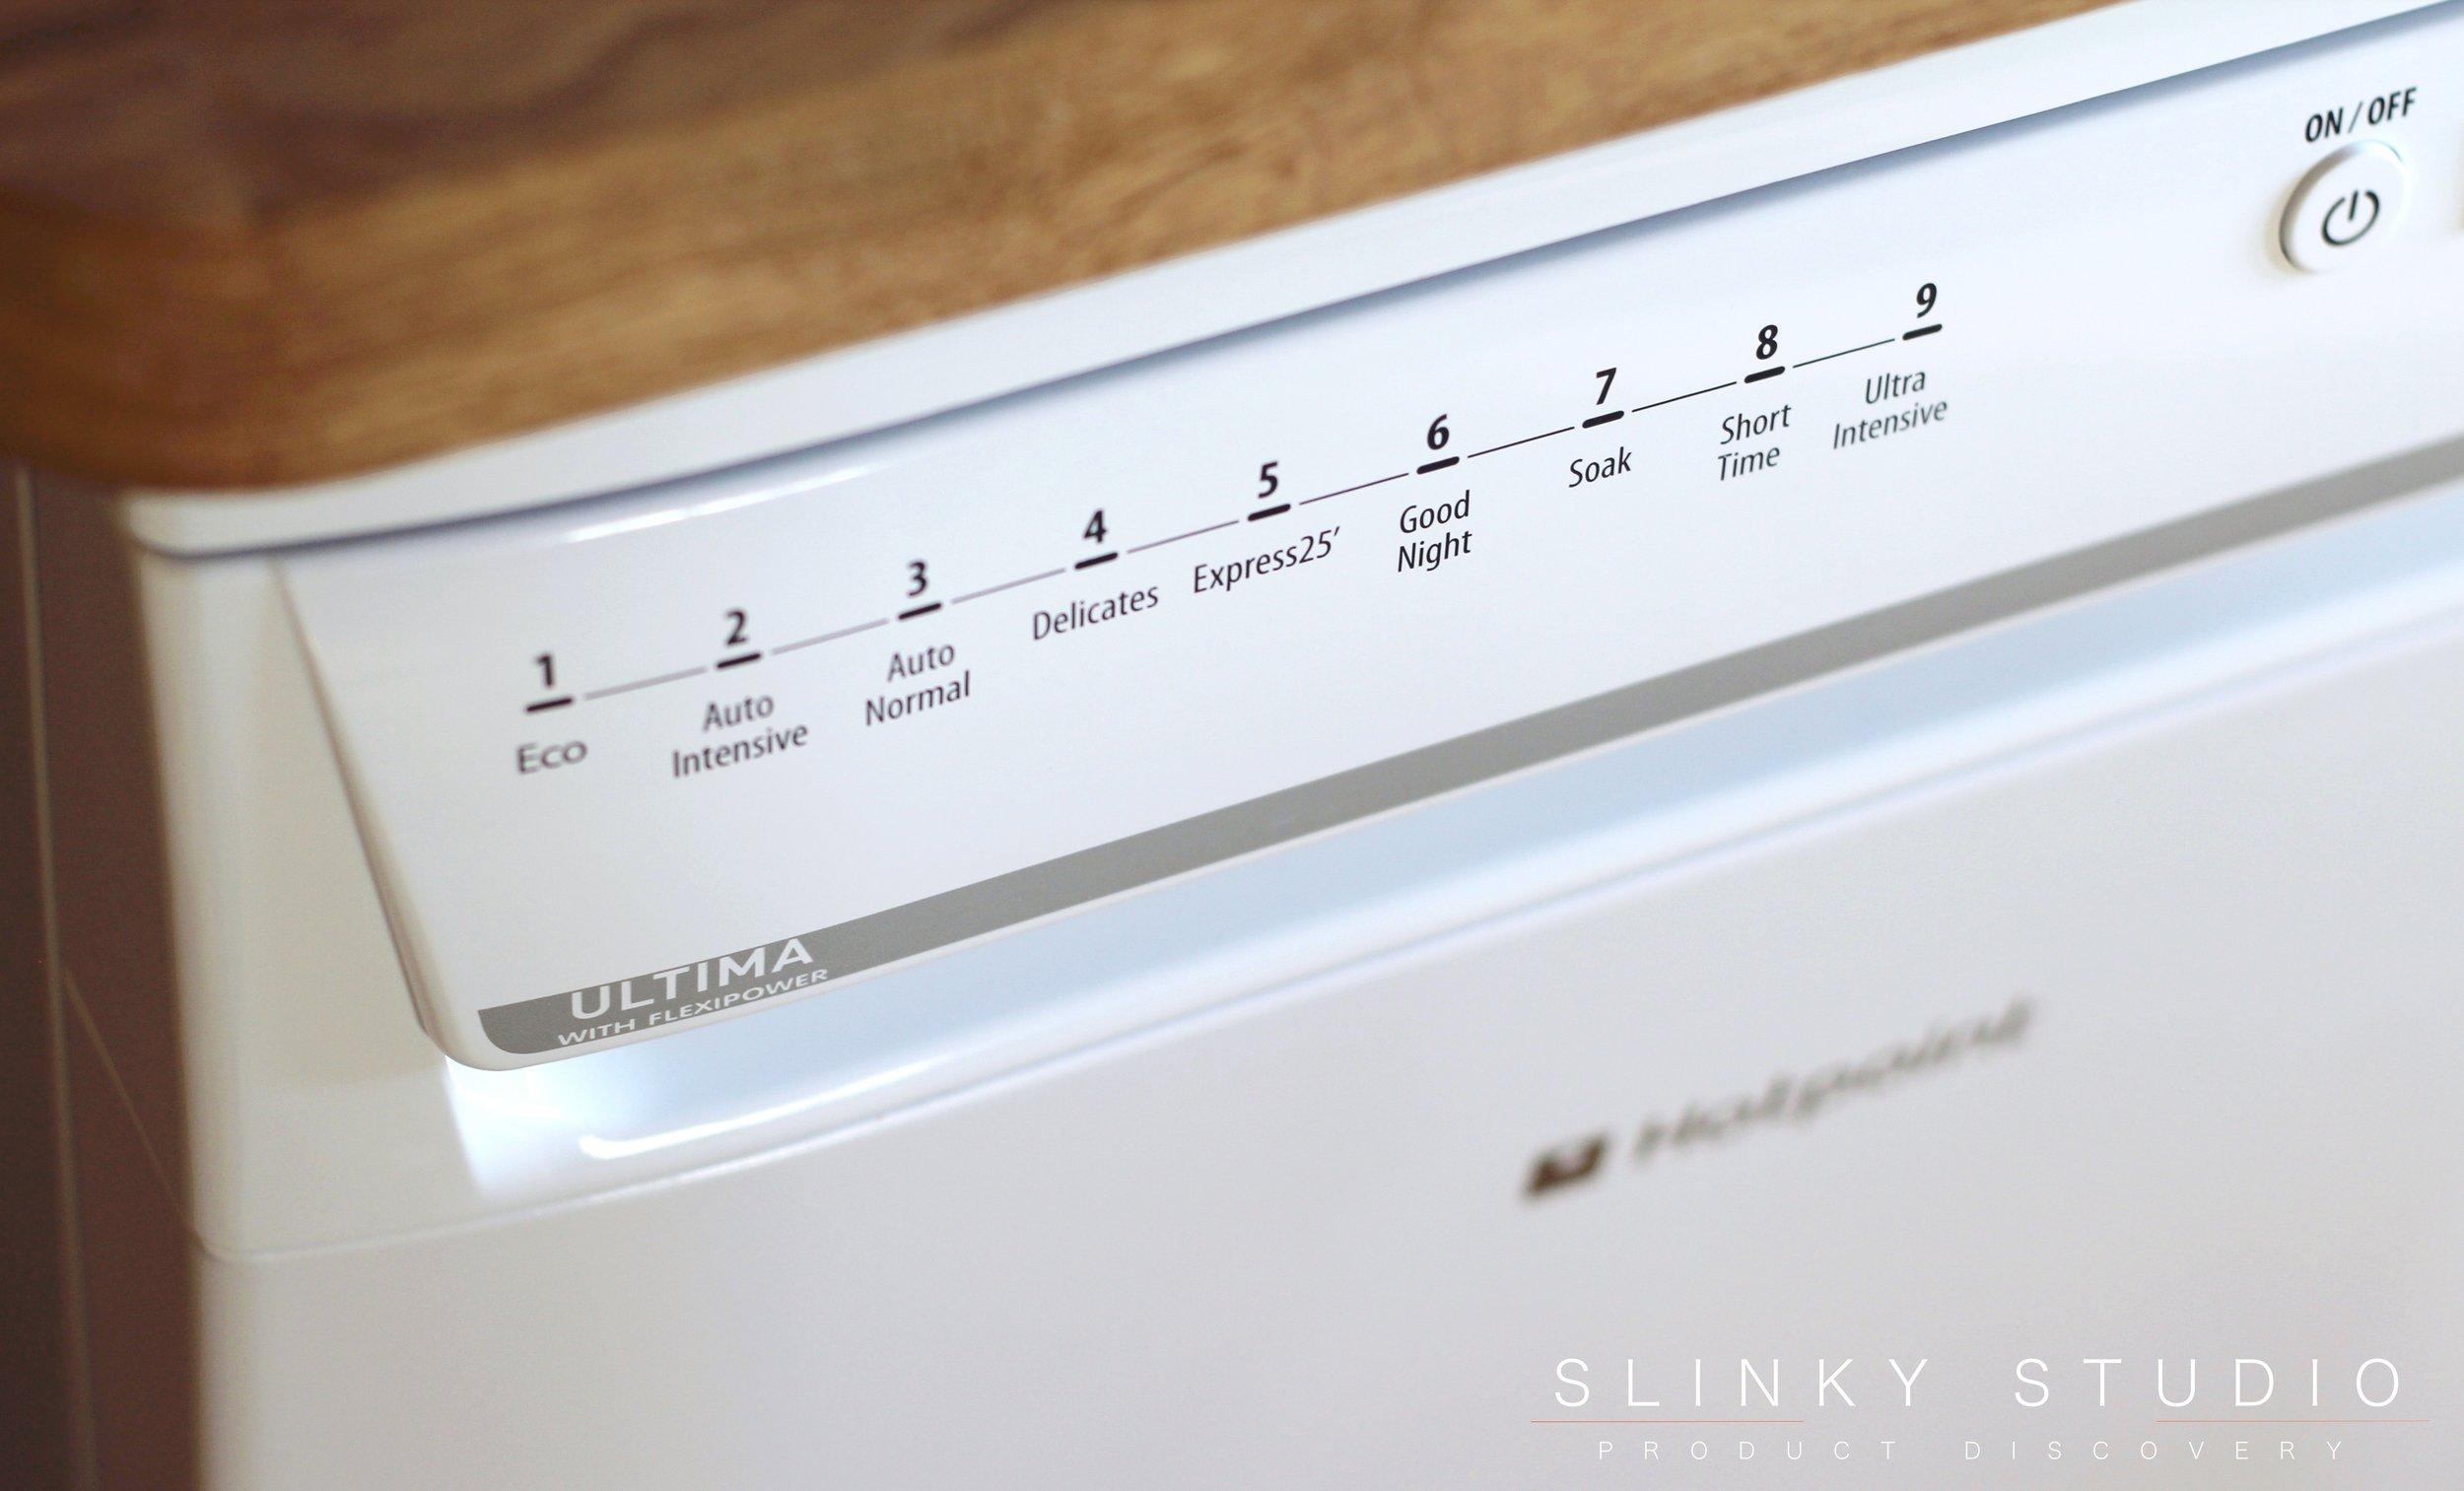 Hotpoint Ultima Slimline Dishwasher Modes.jpg